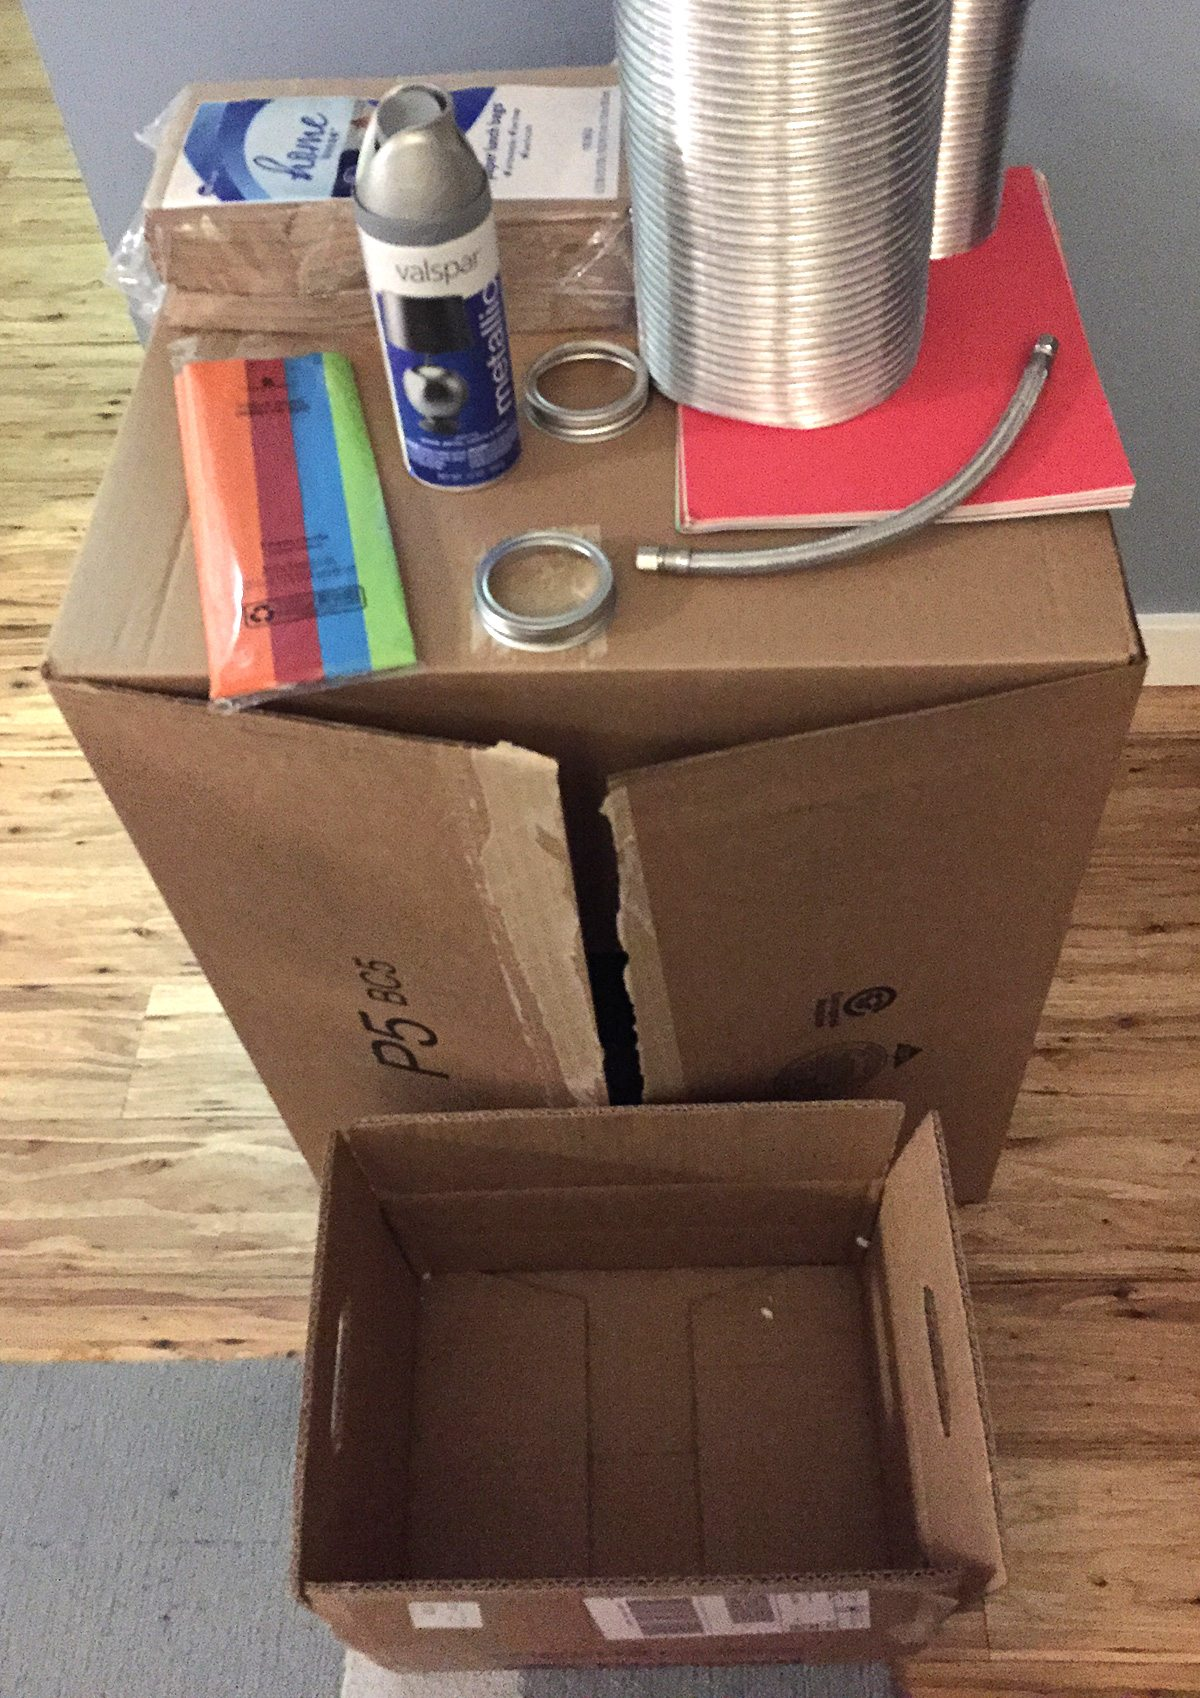 My pile of robot making supplies.